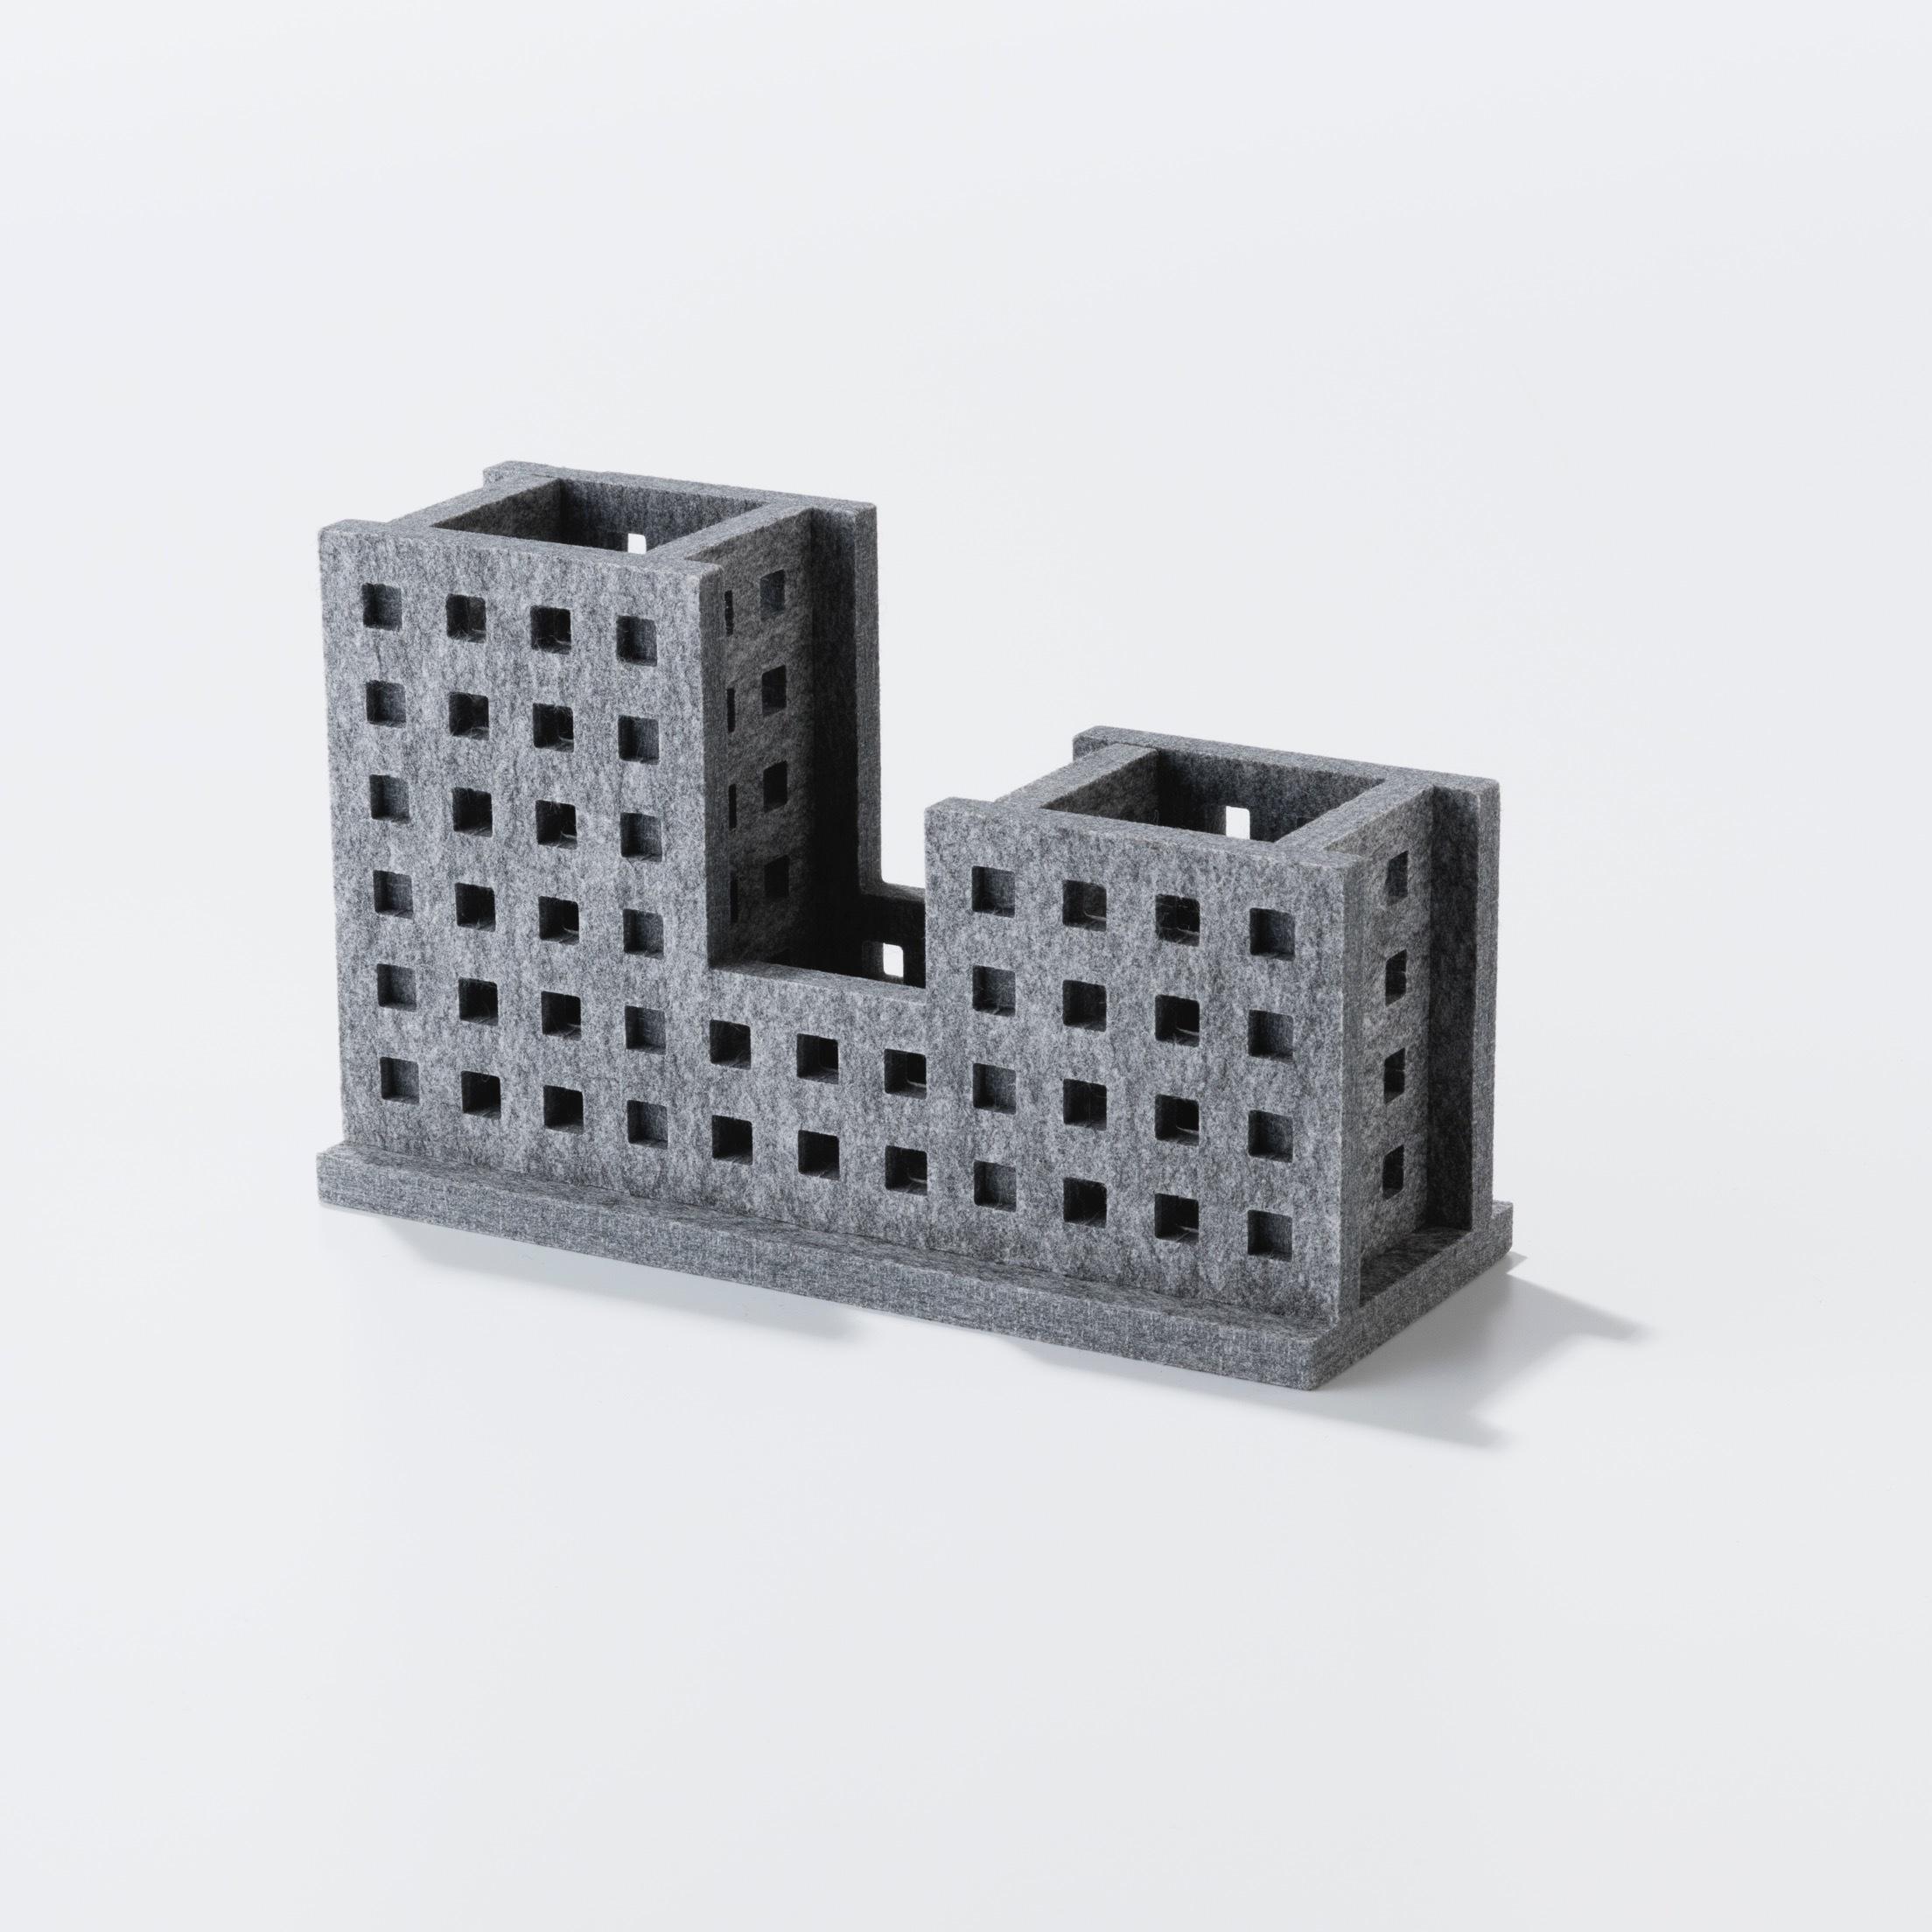 3色展開 DESKTOP ORGANIZER - Building(小物入れ)【日本製】